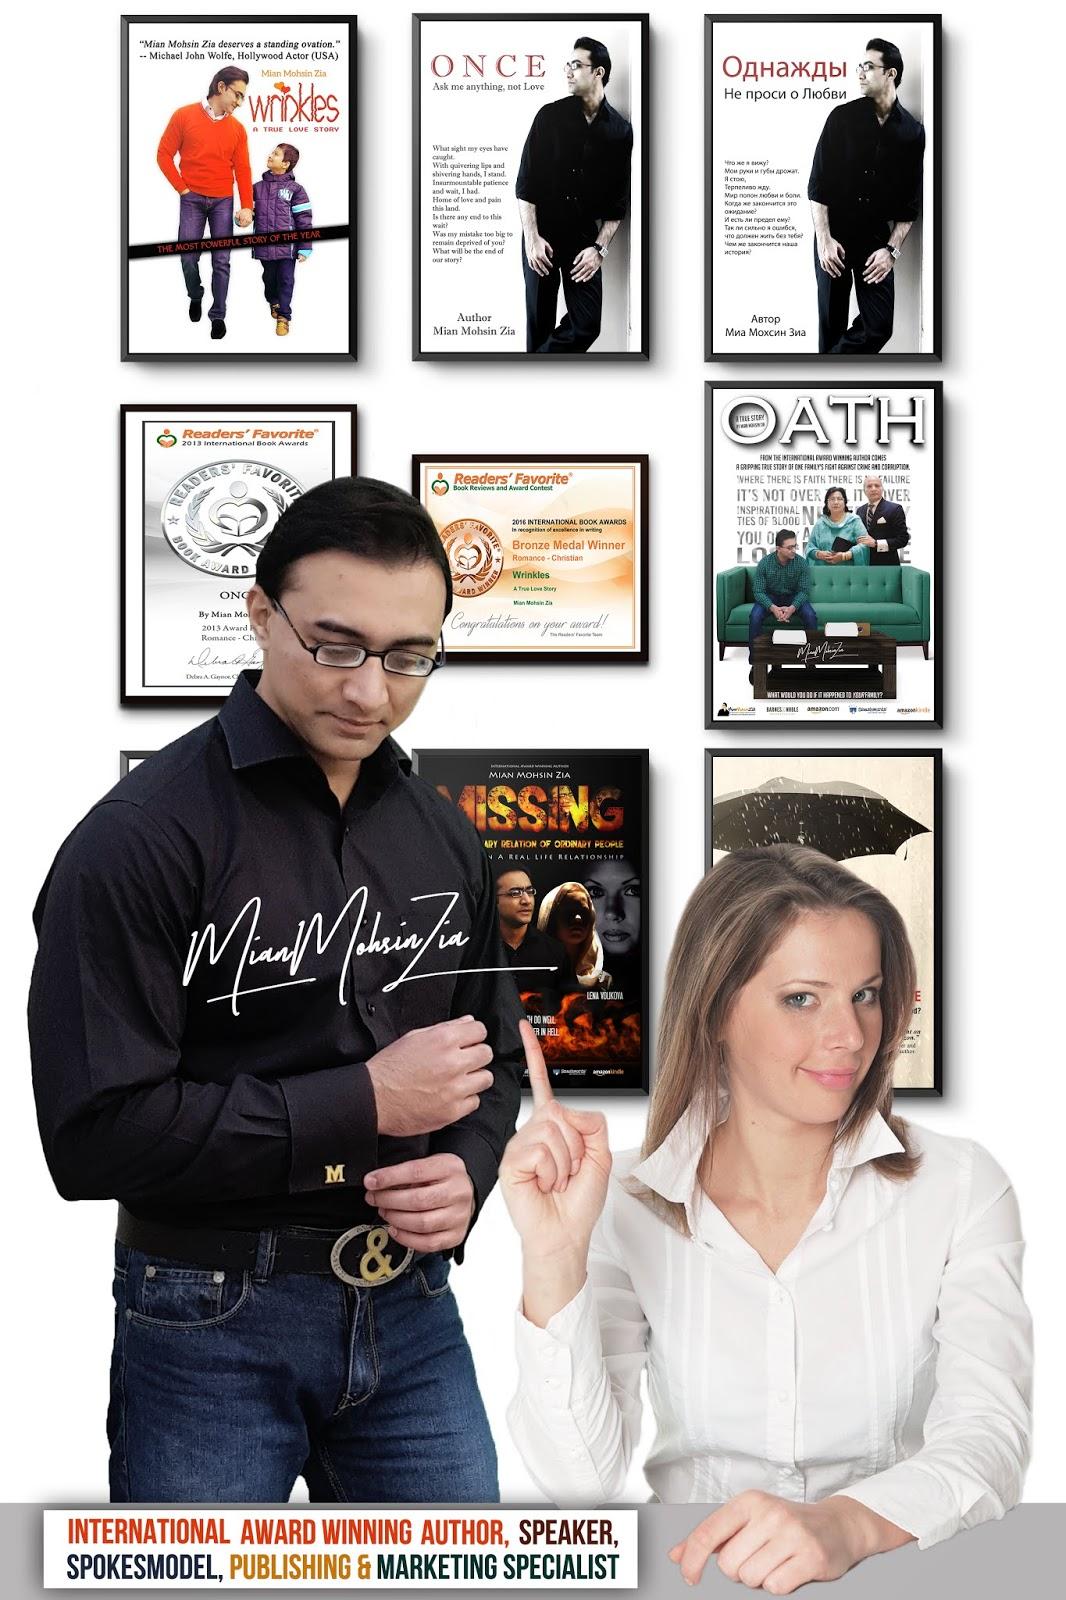 Mian Mohsin Zia - International Award Winning Author l Speaker l Spokesmodel l Publishing & Marketing Specialist